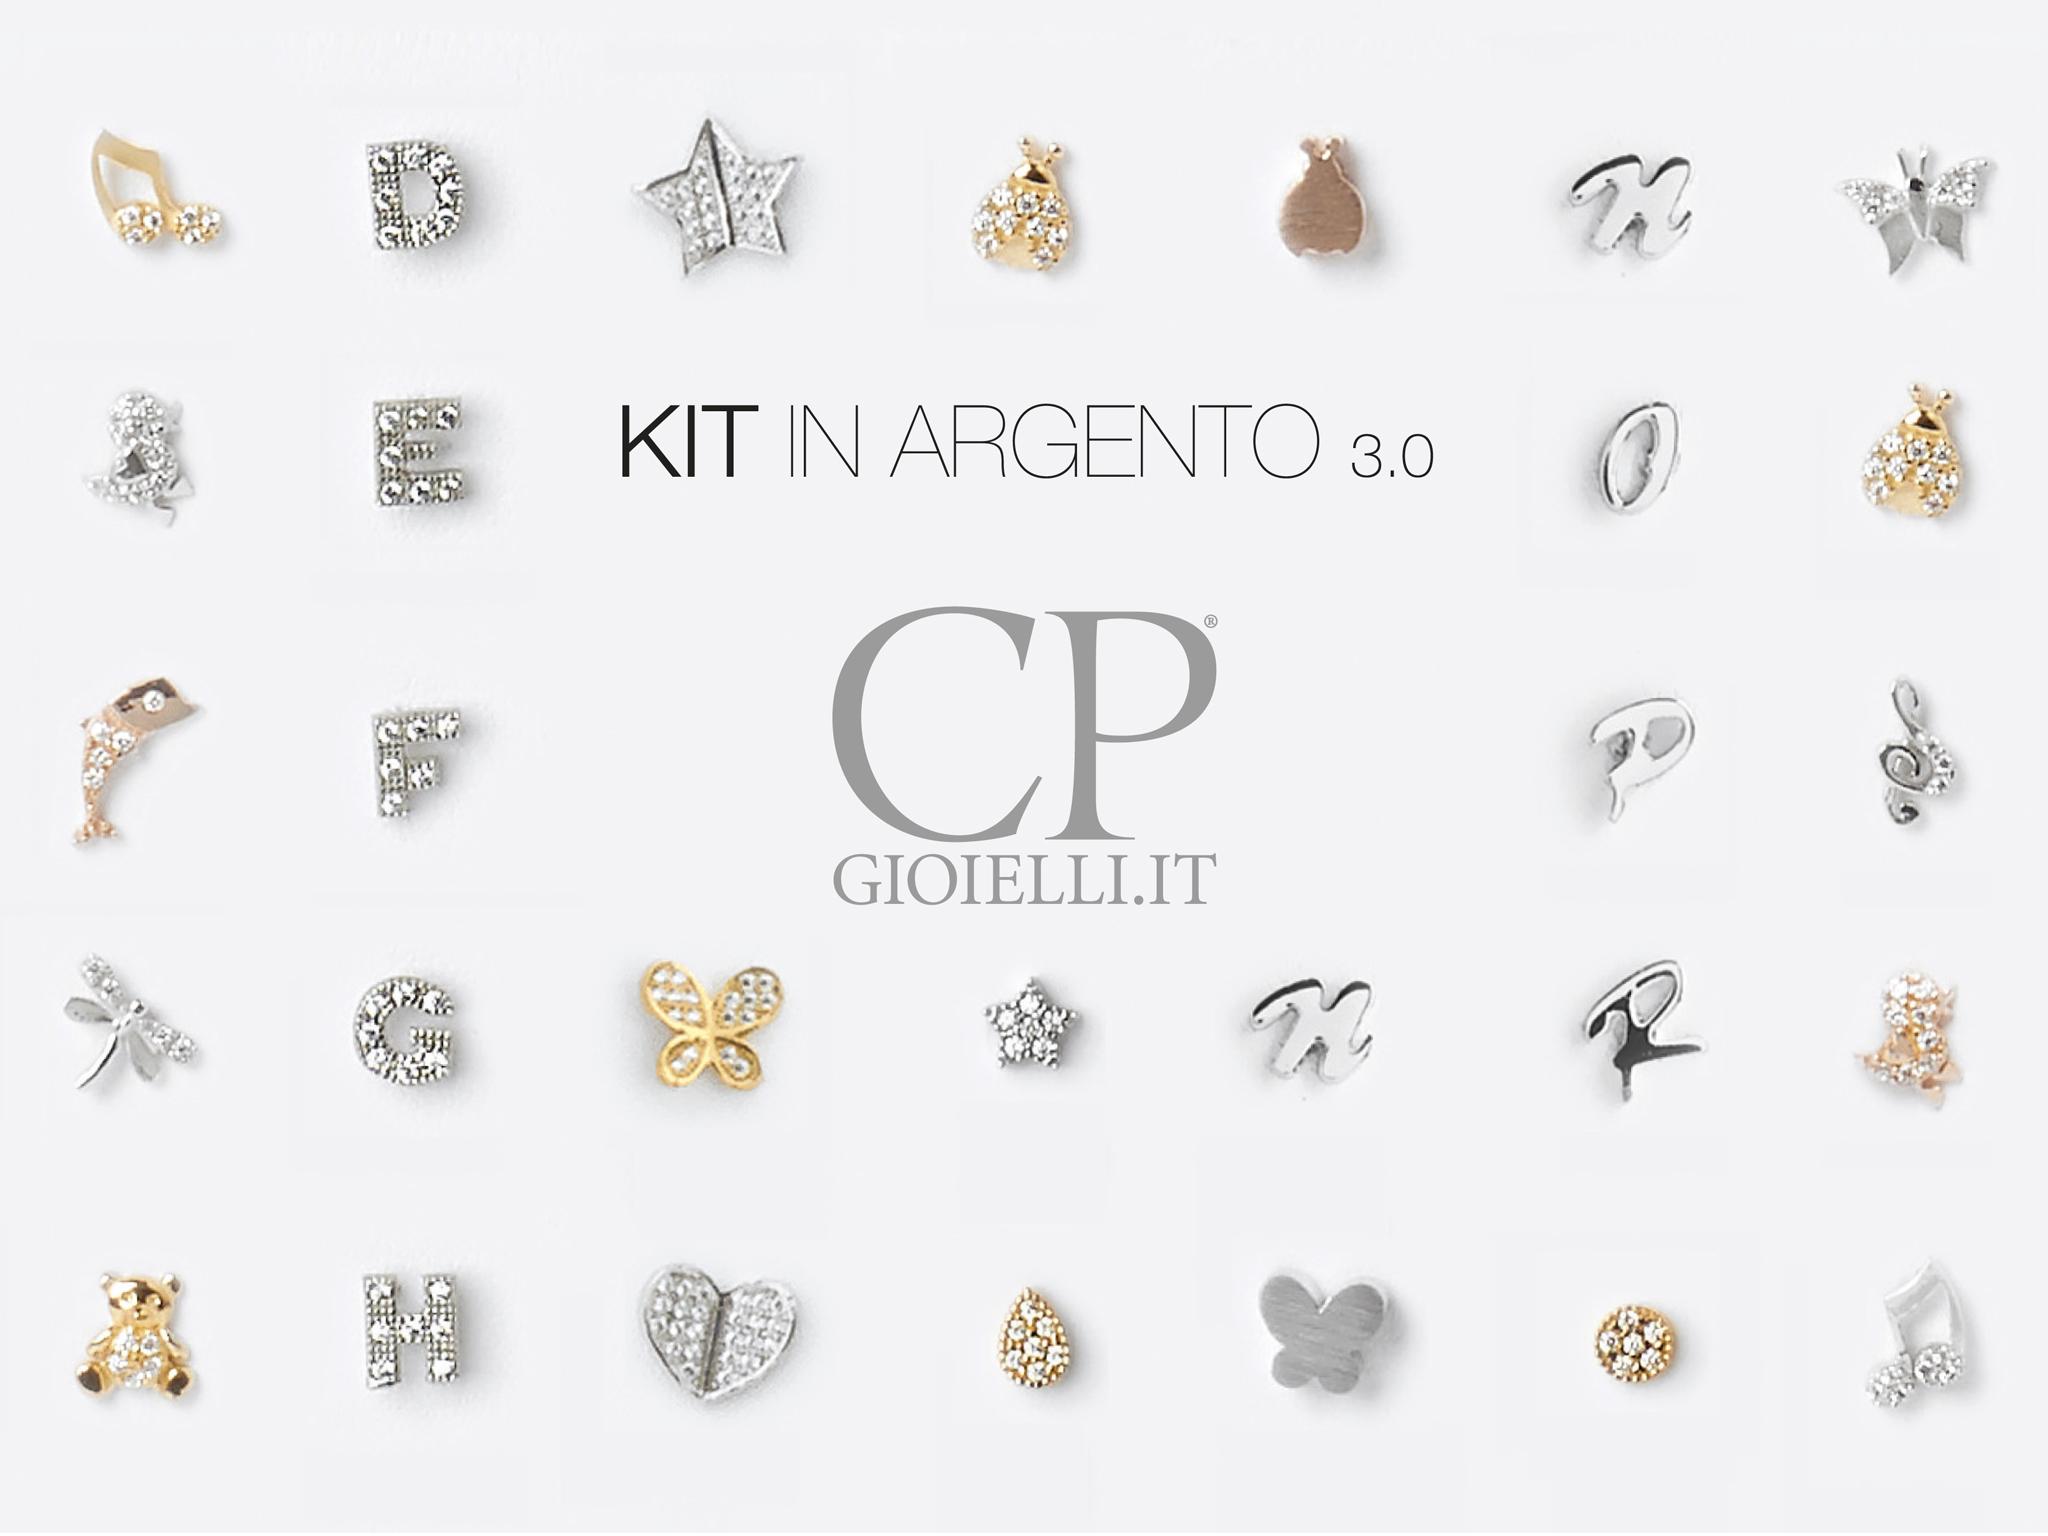 kit_argento_3.0_2016_pagina_1_APP